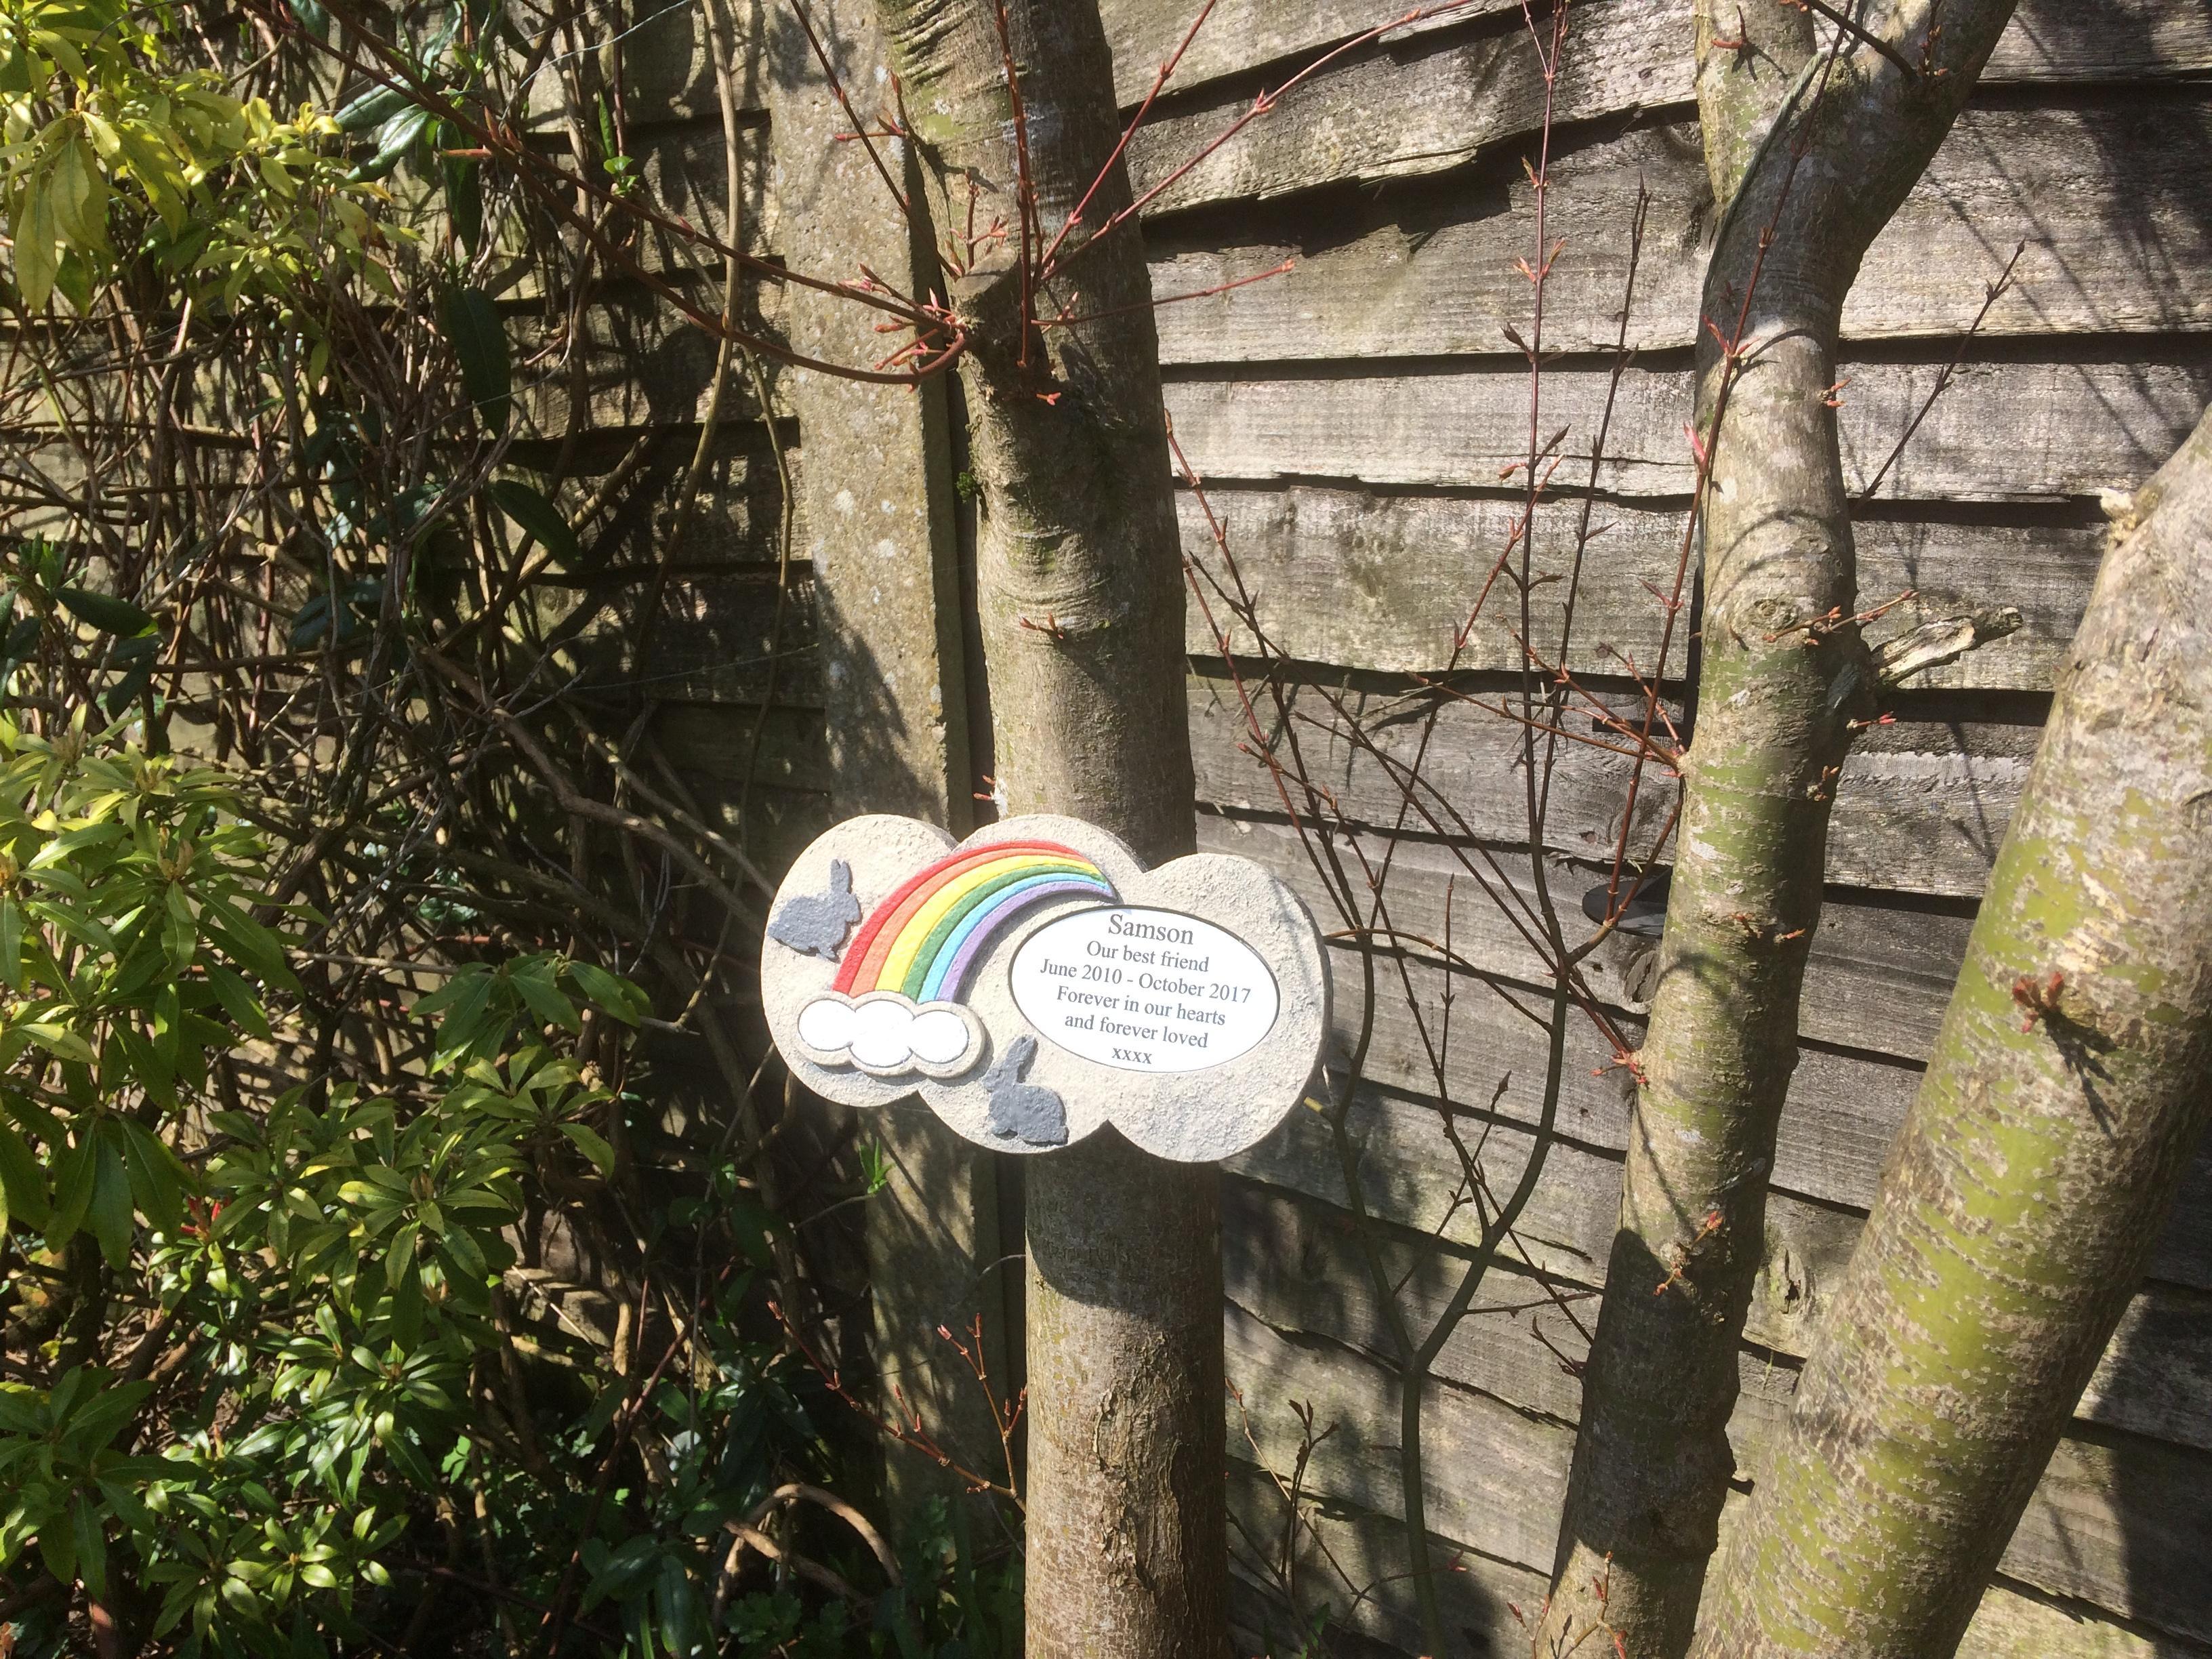 Rainbow Bridge Memorial Stone : Personalised rainbow bridge stone memorial for rabbit